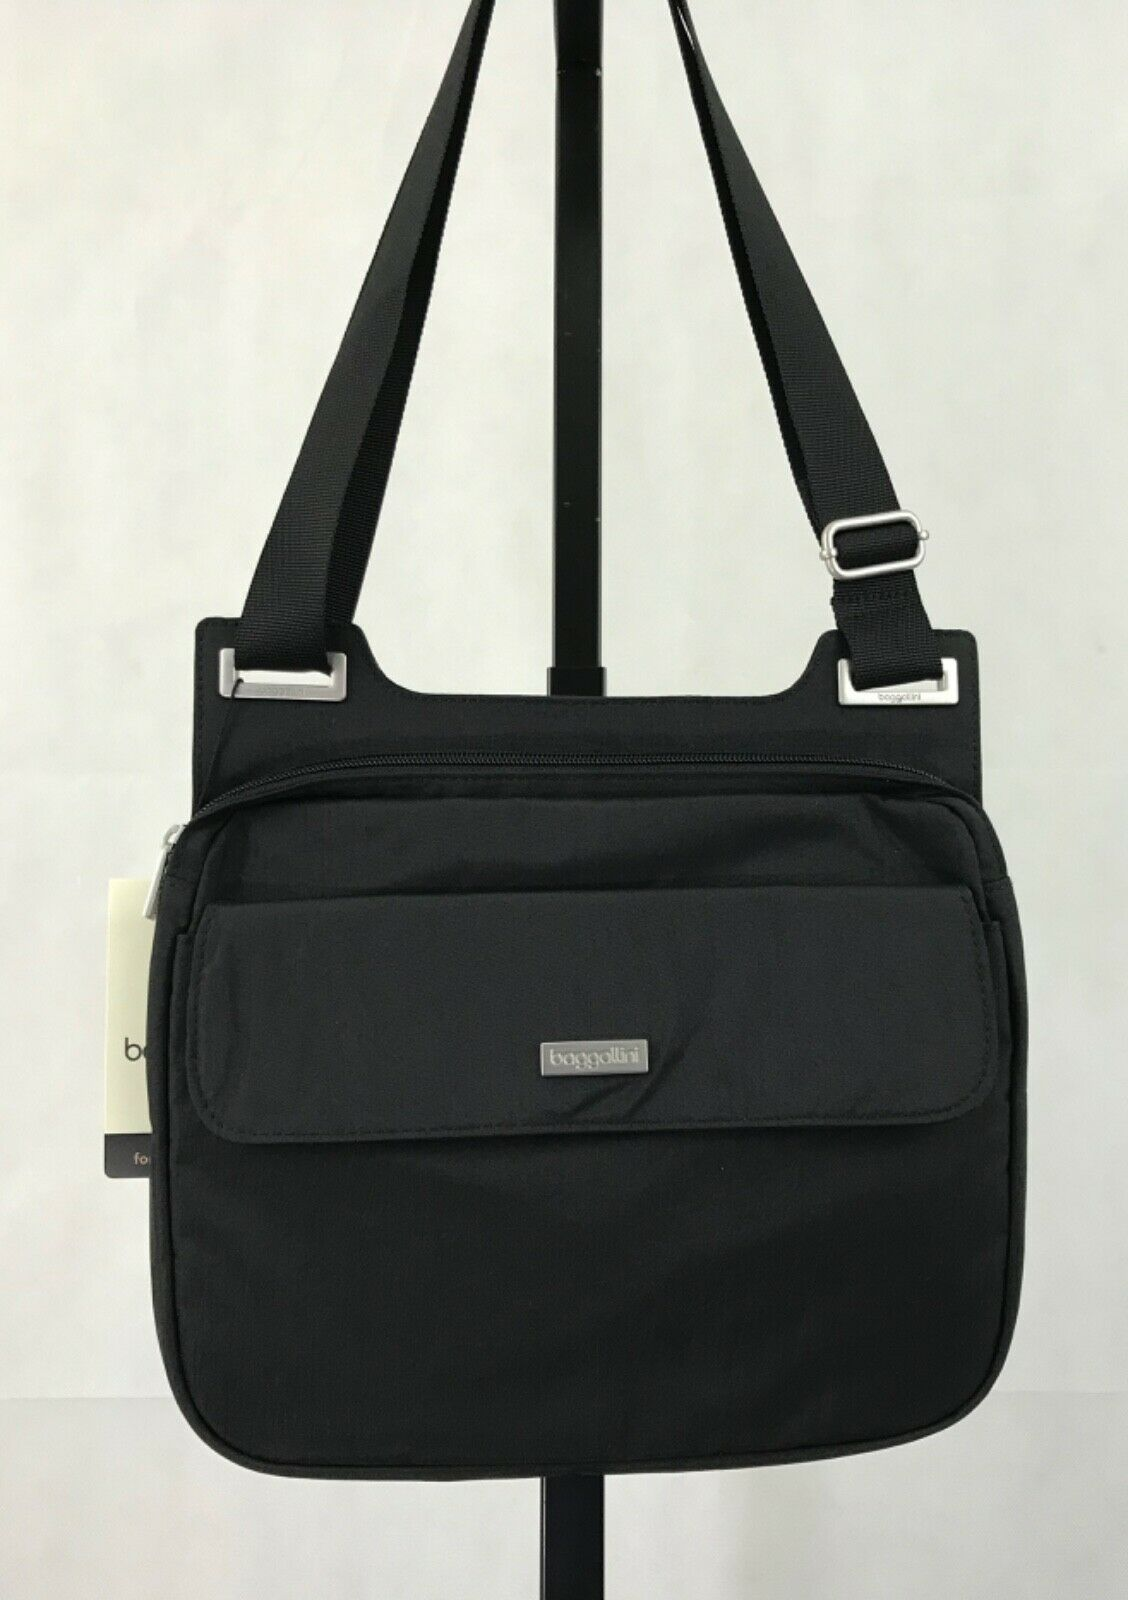 baggallini Crossbody Travel Bag Black NWT Lightweight Purse